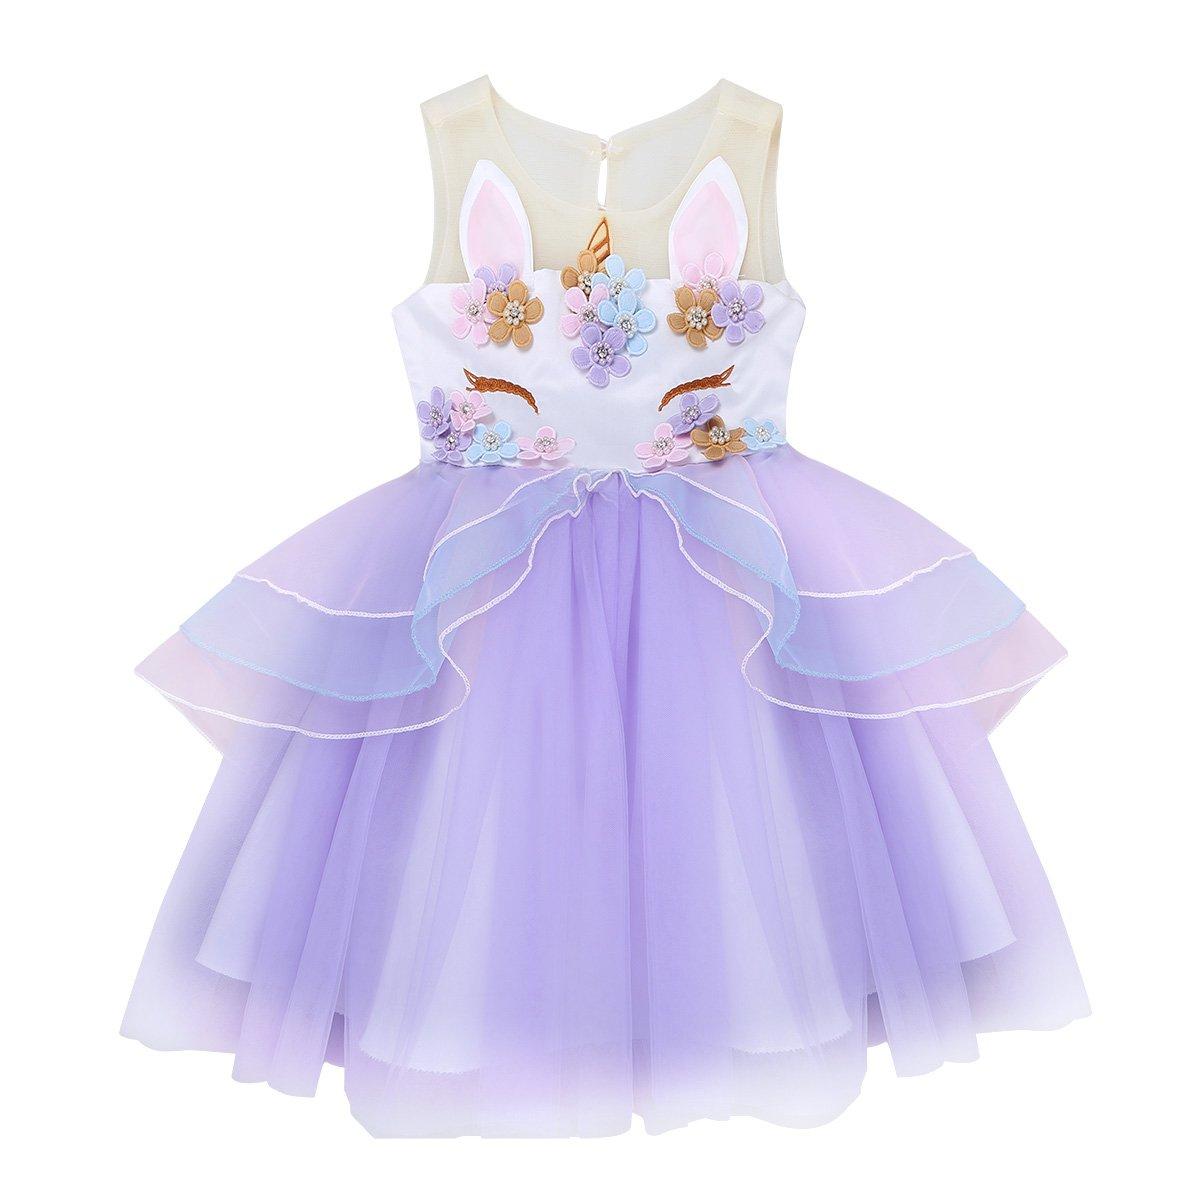 Amazon.com: feeshow niños disfraces de niña planchando de 3d ...